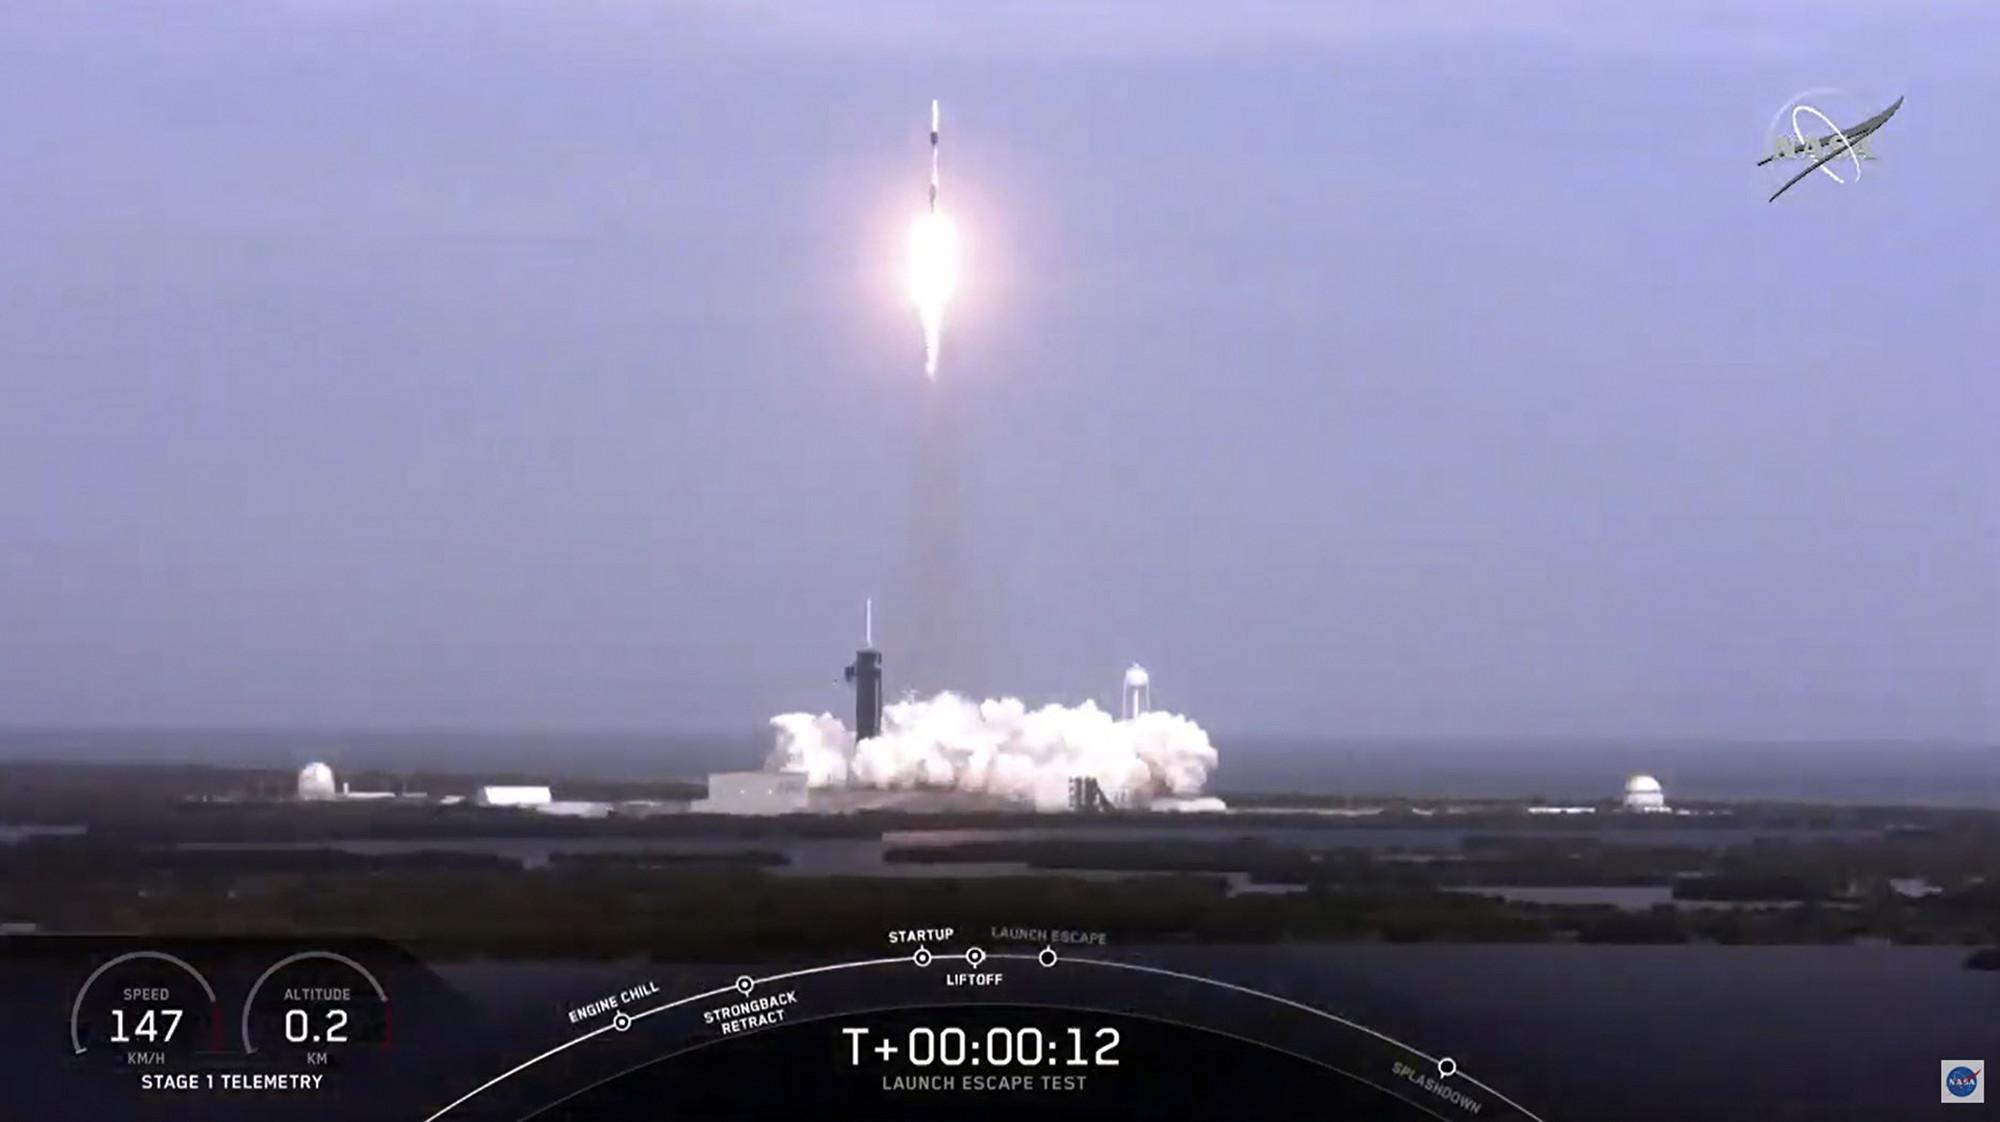 SpaceX於1月19日通過了一個載人太空艙的關鍵安全測試。(NASA TV / AFP)